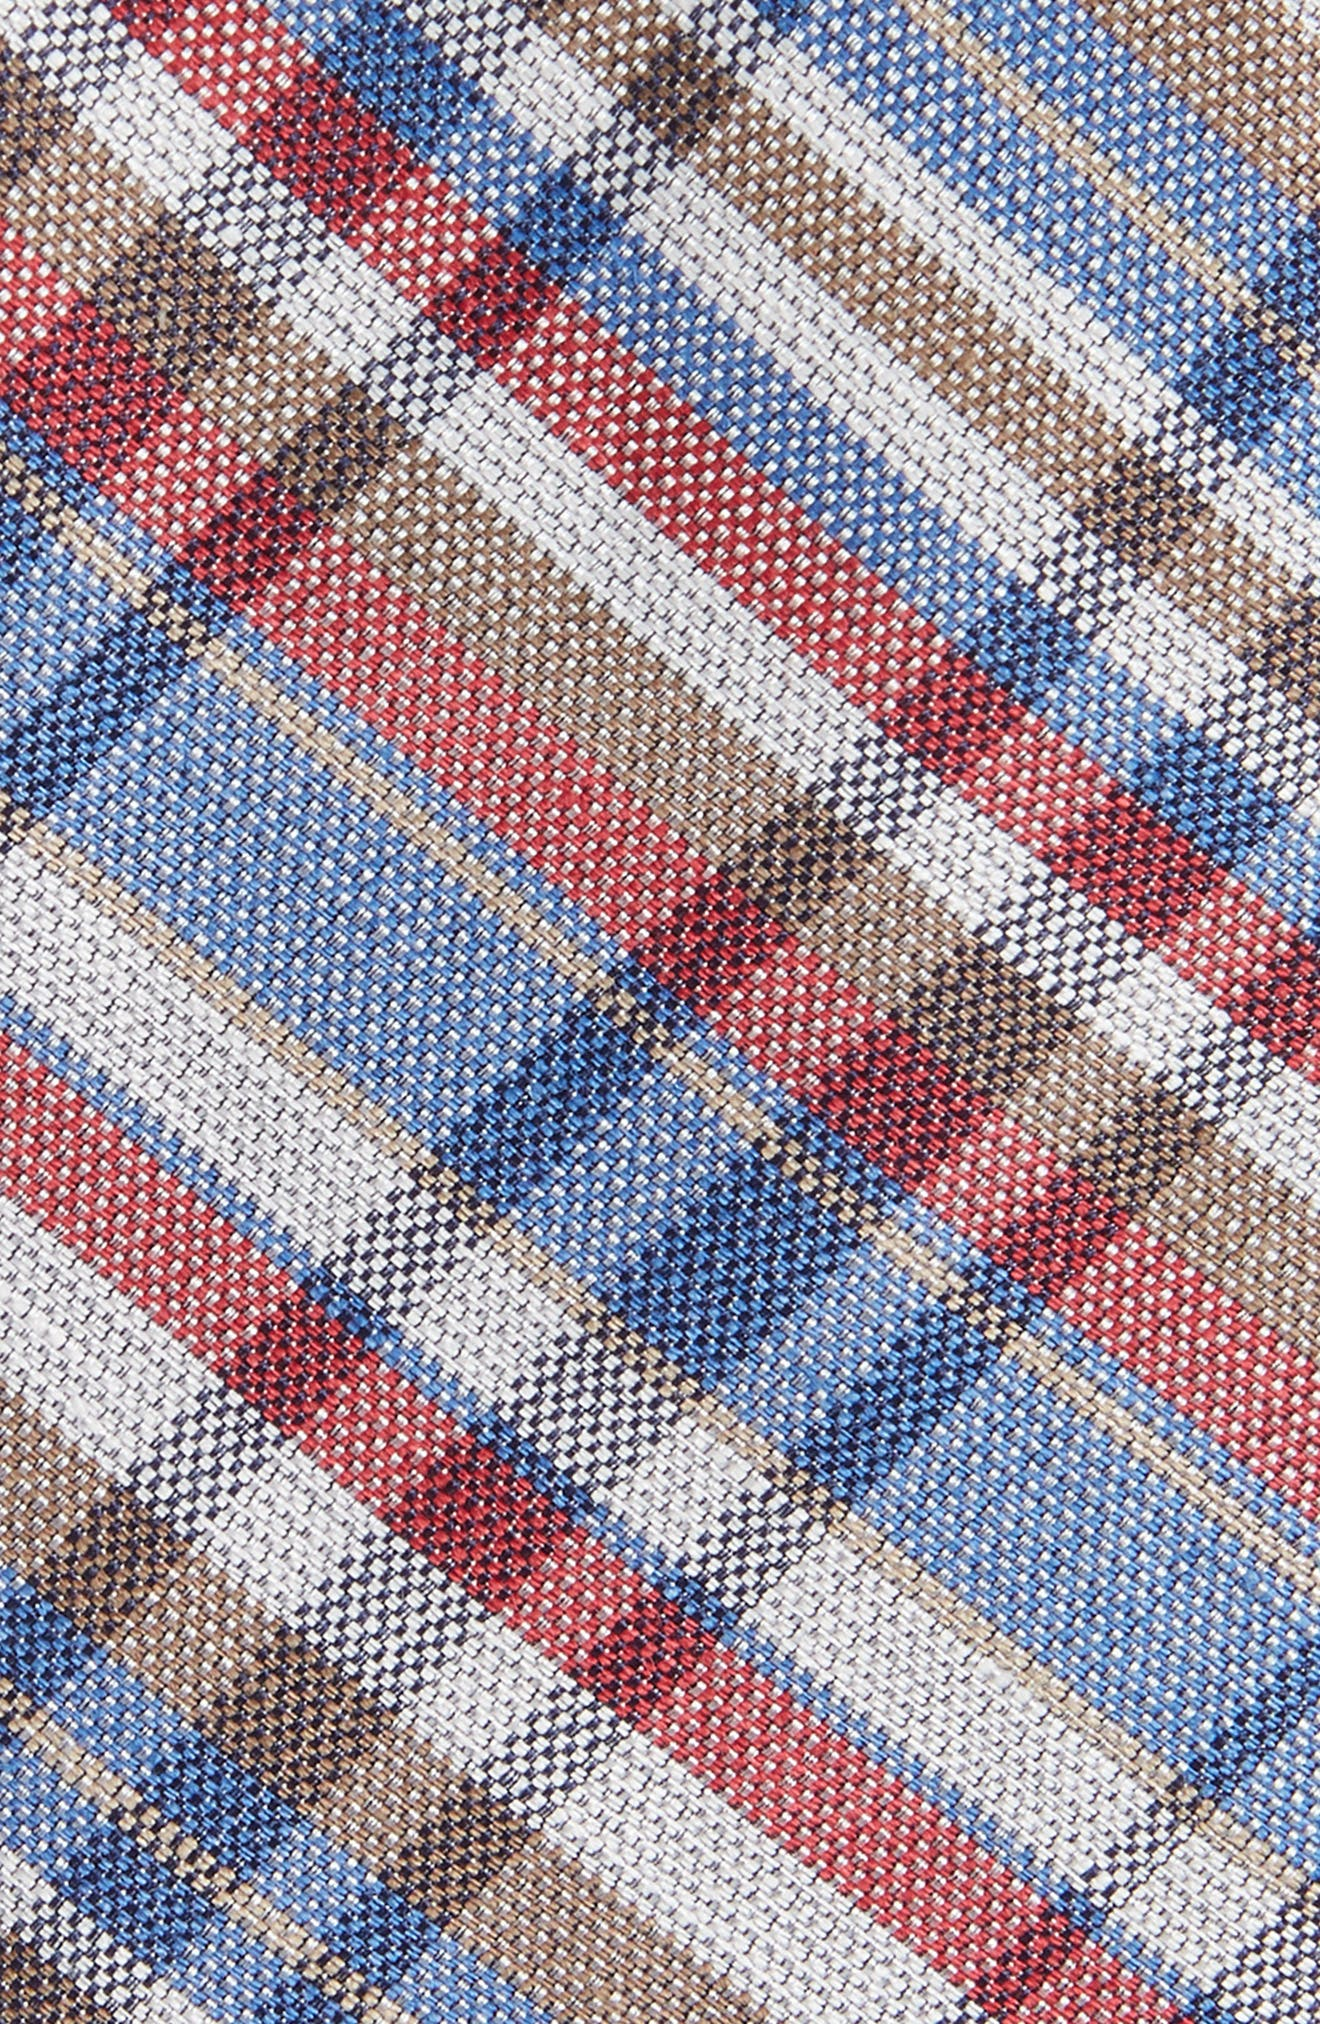 Donelly Plaid Linen & Silk Tie,                             Alternate thumbnail 2, color,                             BLUE